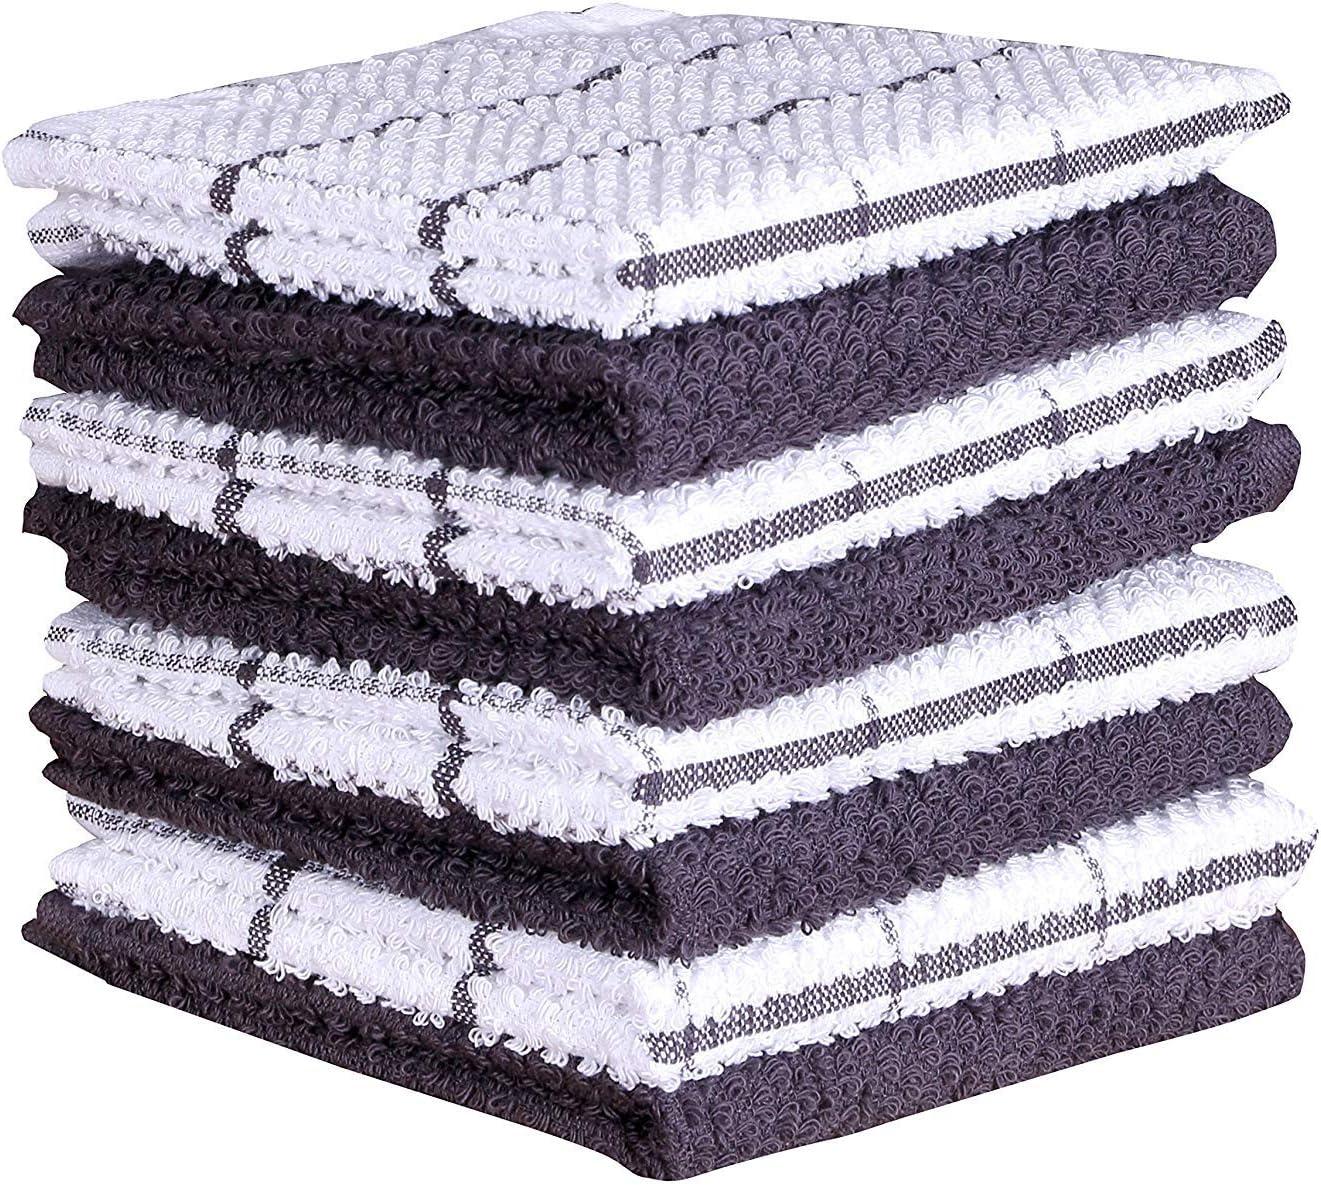 AMOUR INFINI 8PCS Cotton Terry Kitchen Dish Cloths $12.74 Coupon